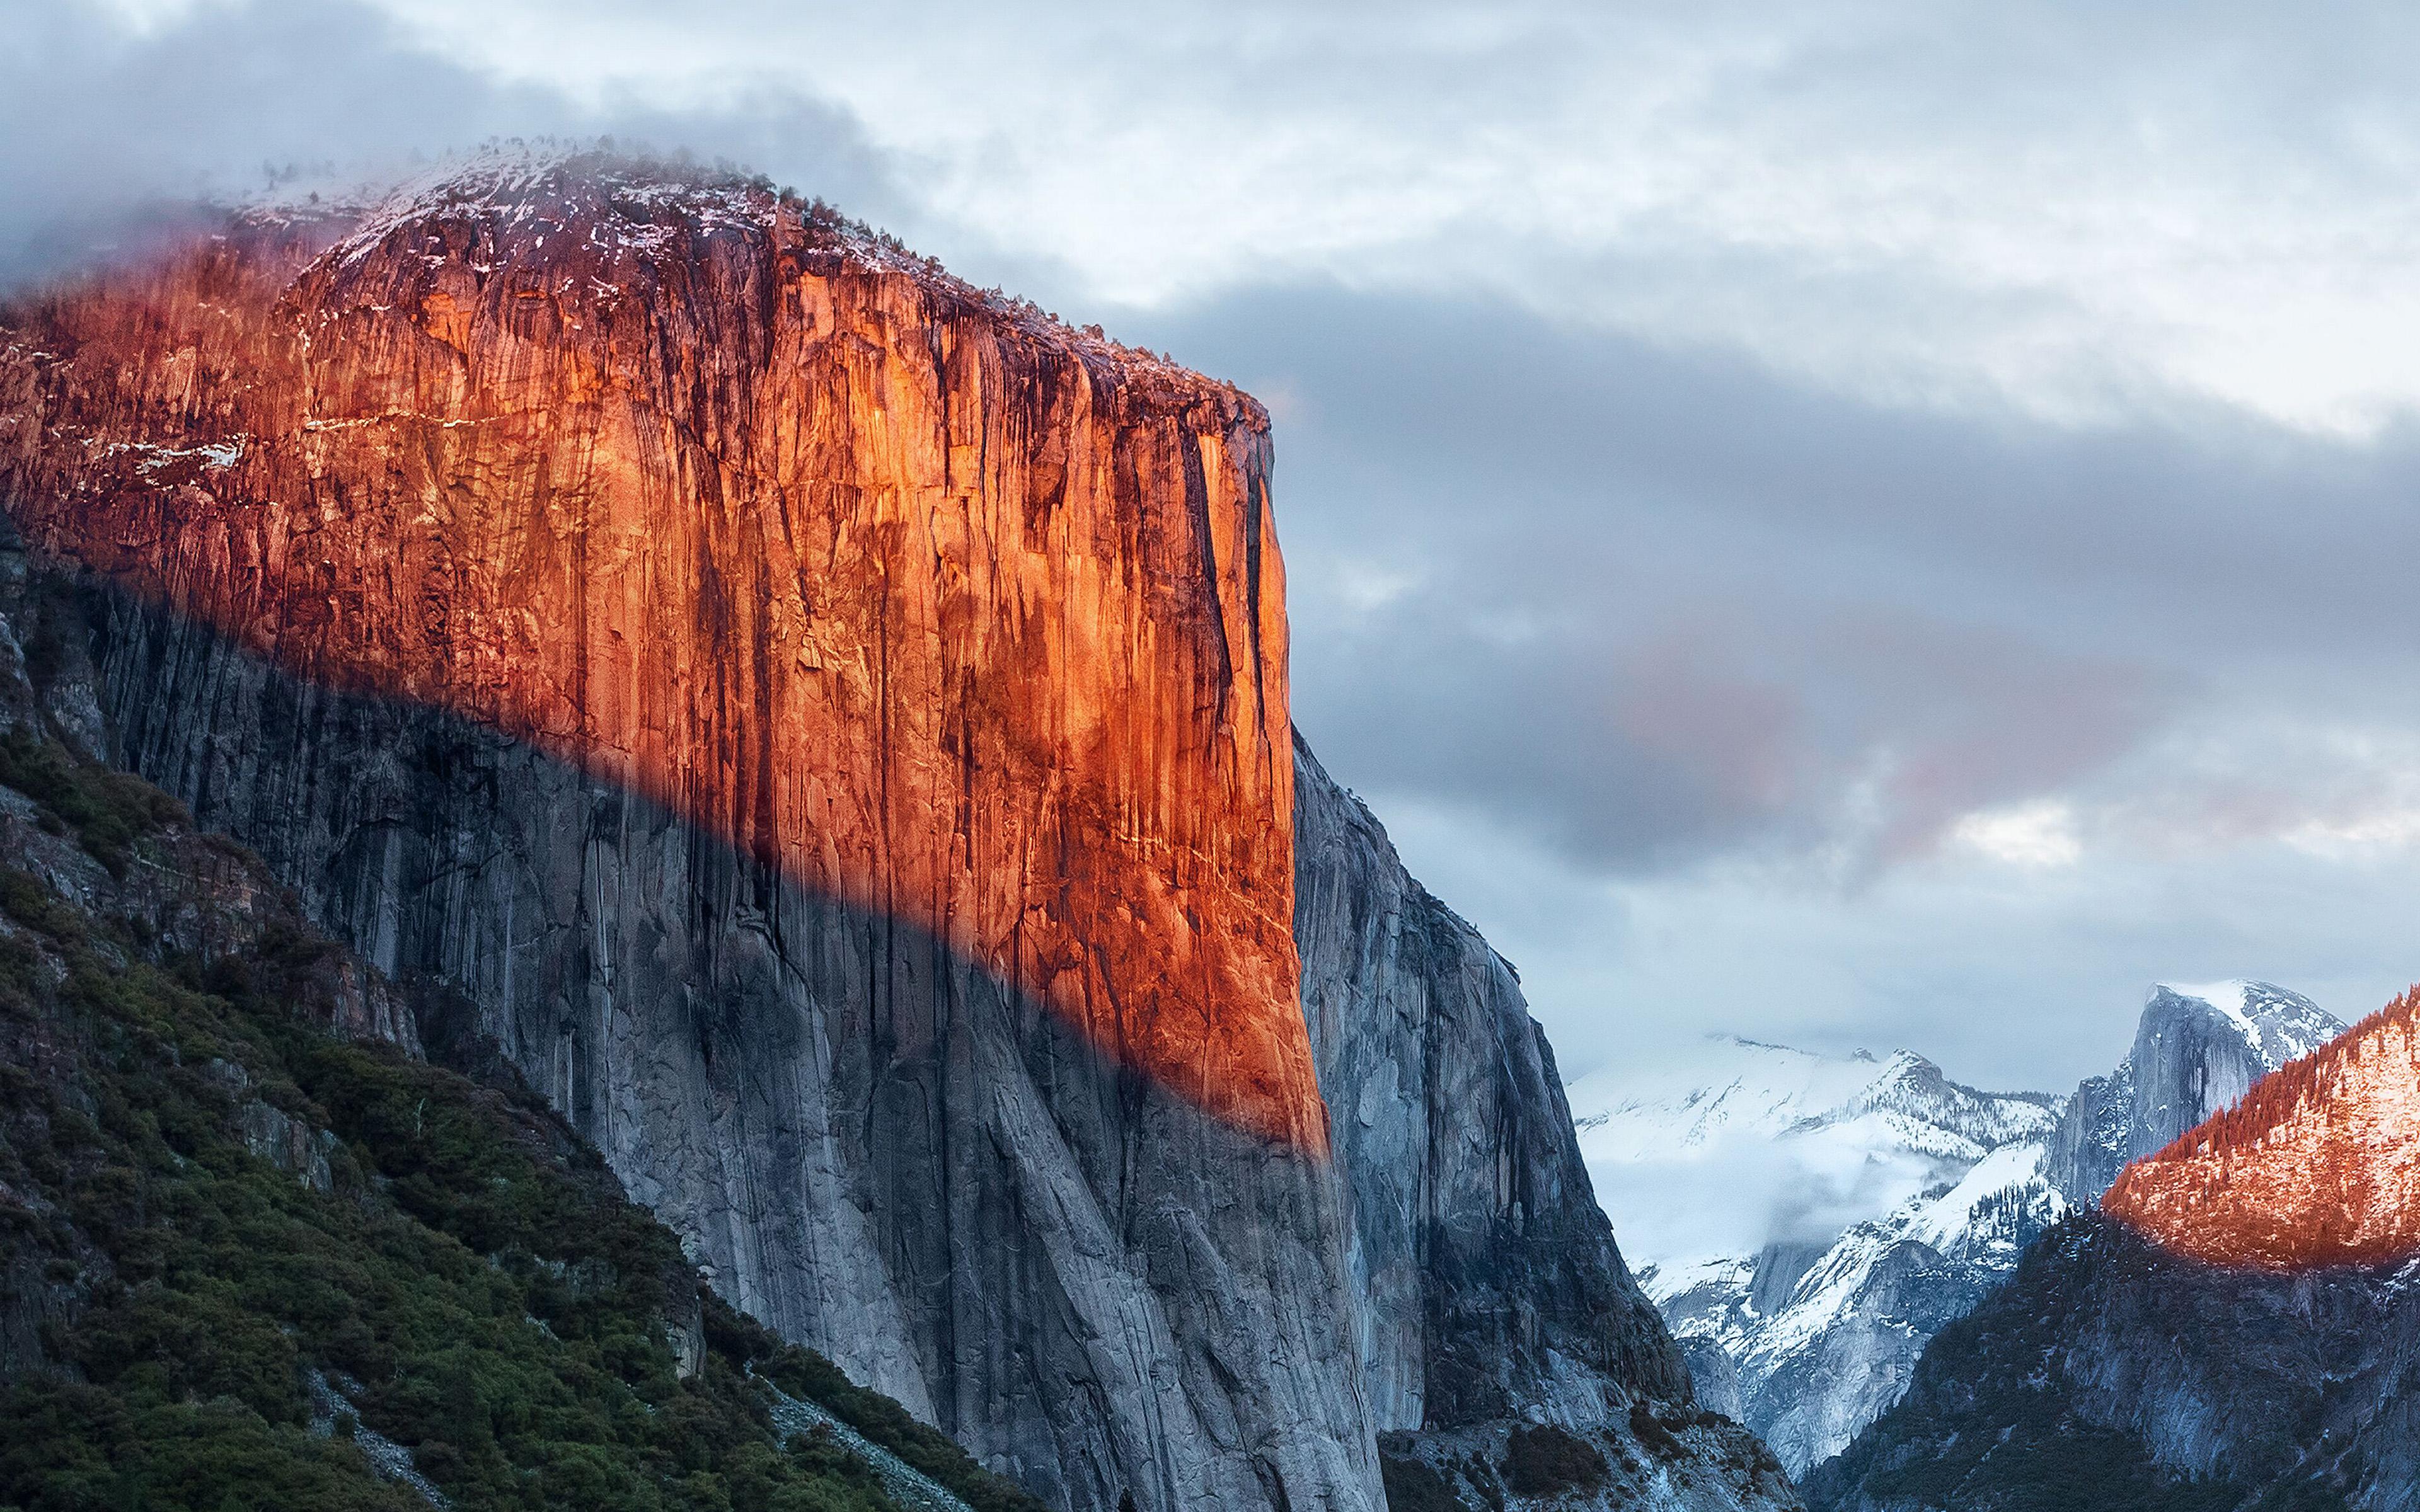 am86-apple-el-capitan-osx-mac-mountain-wwdc-nature - Papers.co